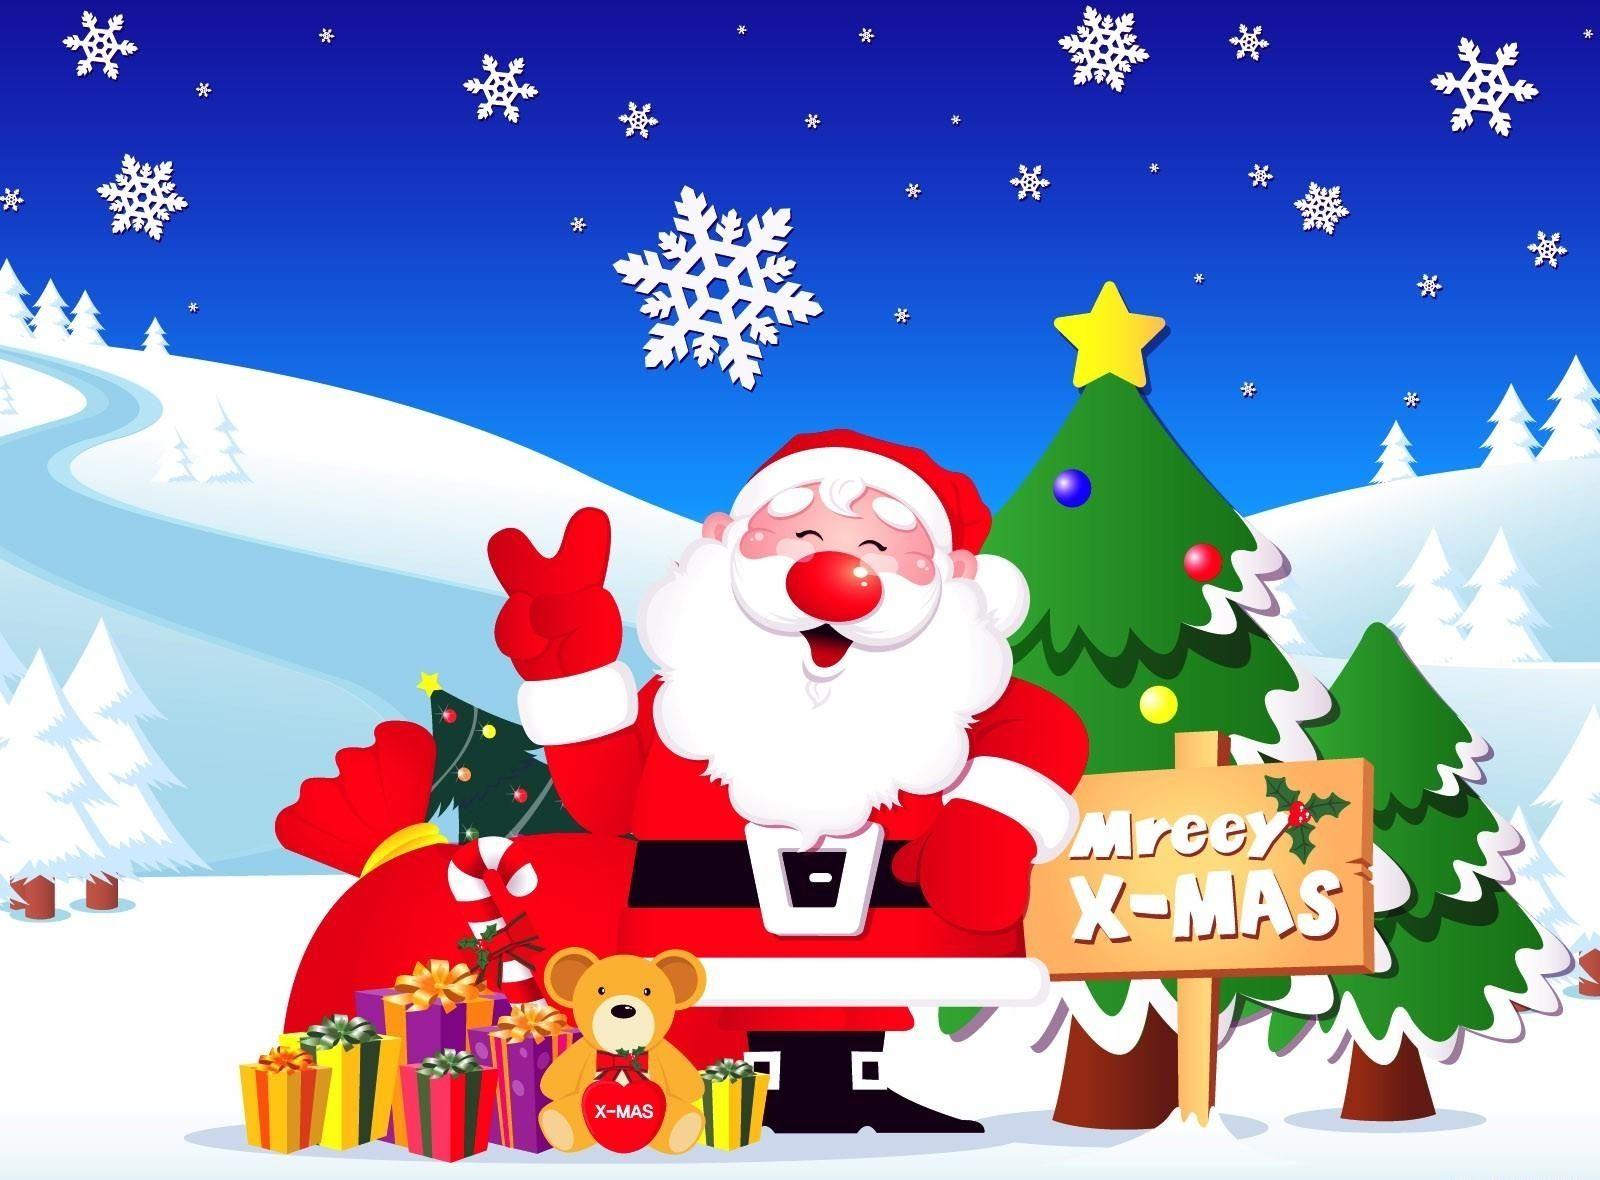 christmas 2014 santa claus - Santa Claus Christmas